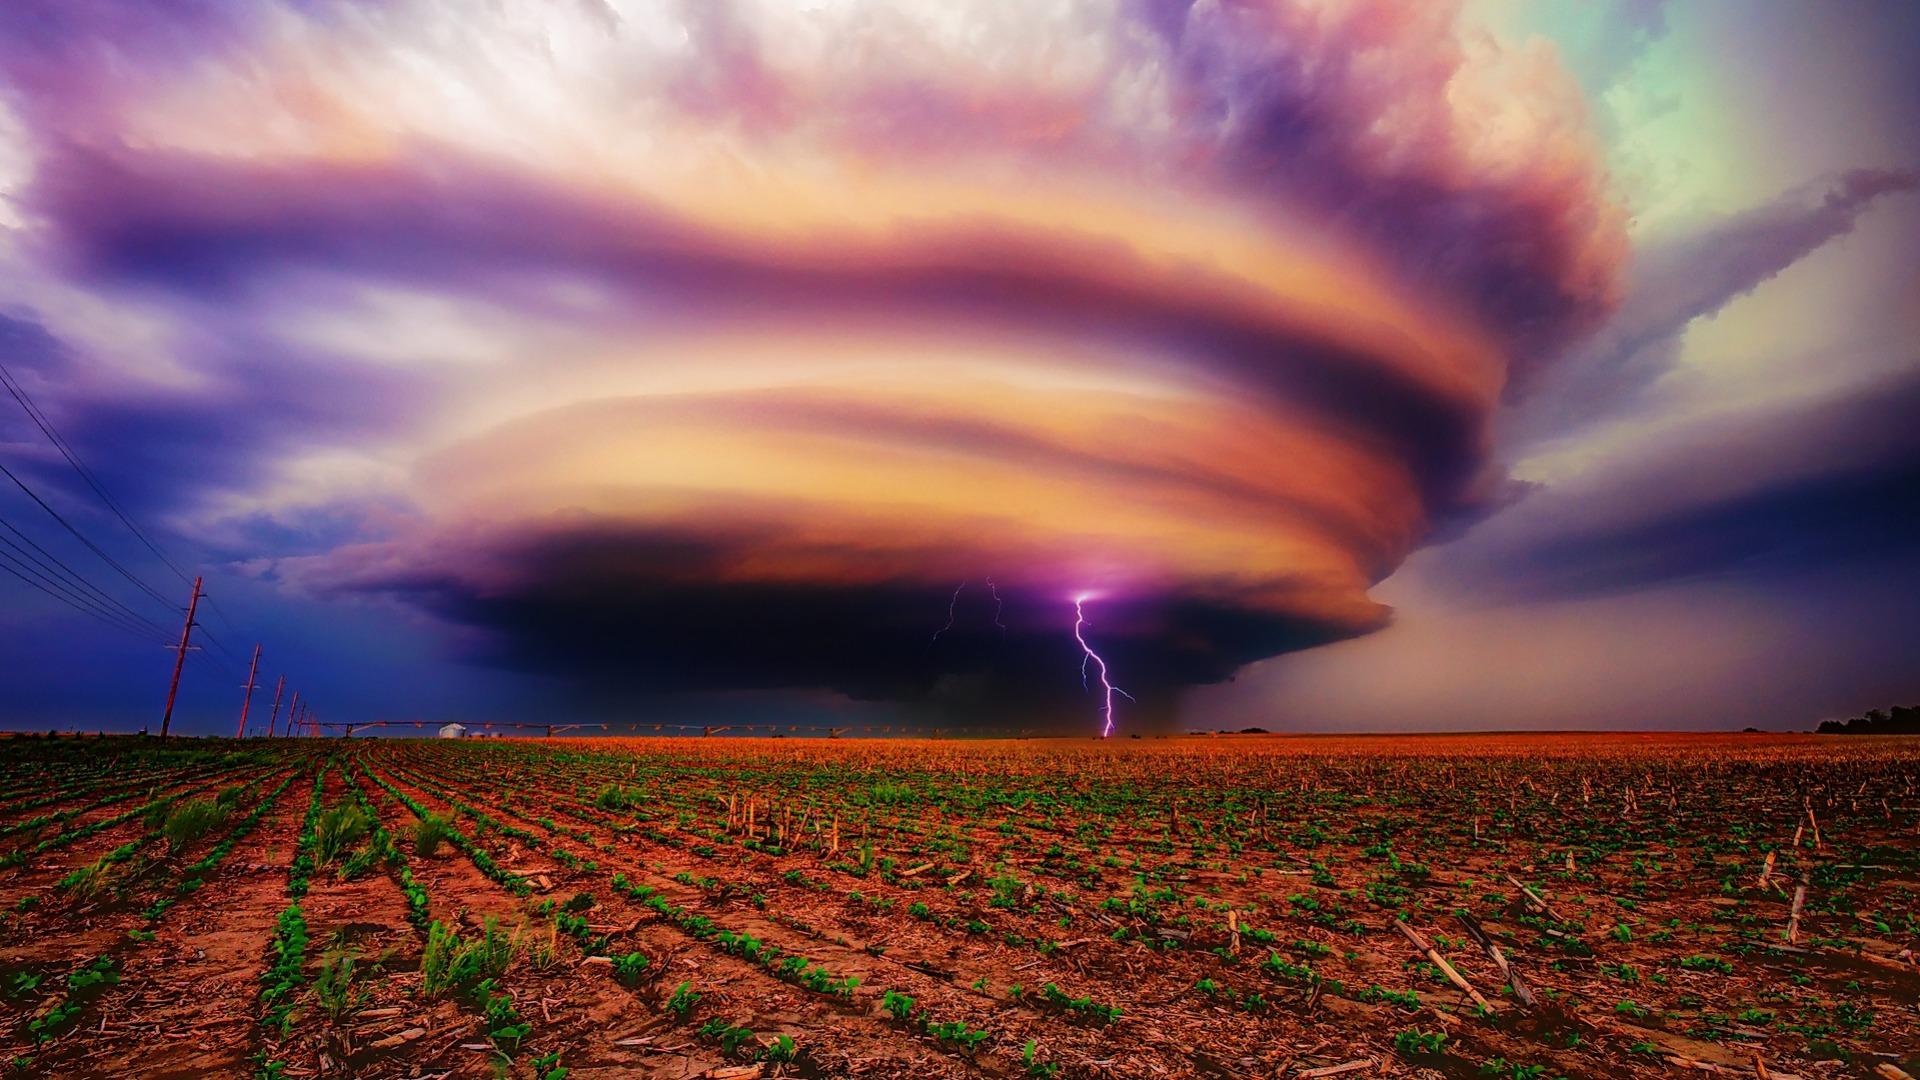 storm hd wallpaper  background image  1920x1080  id